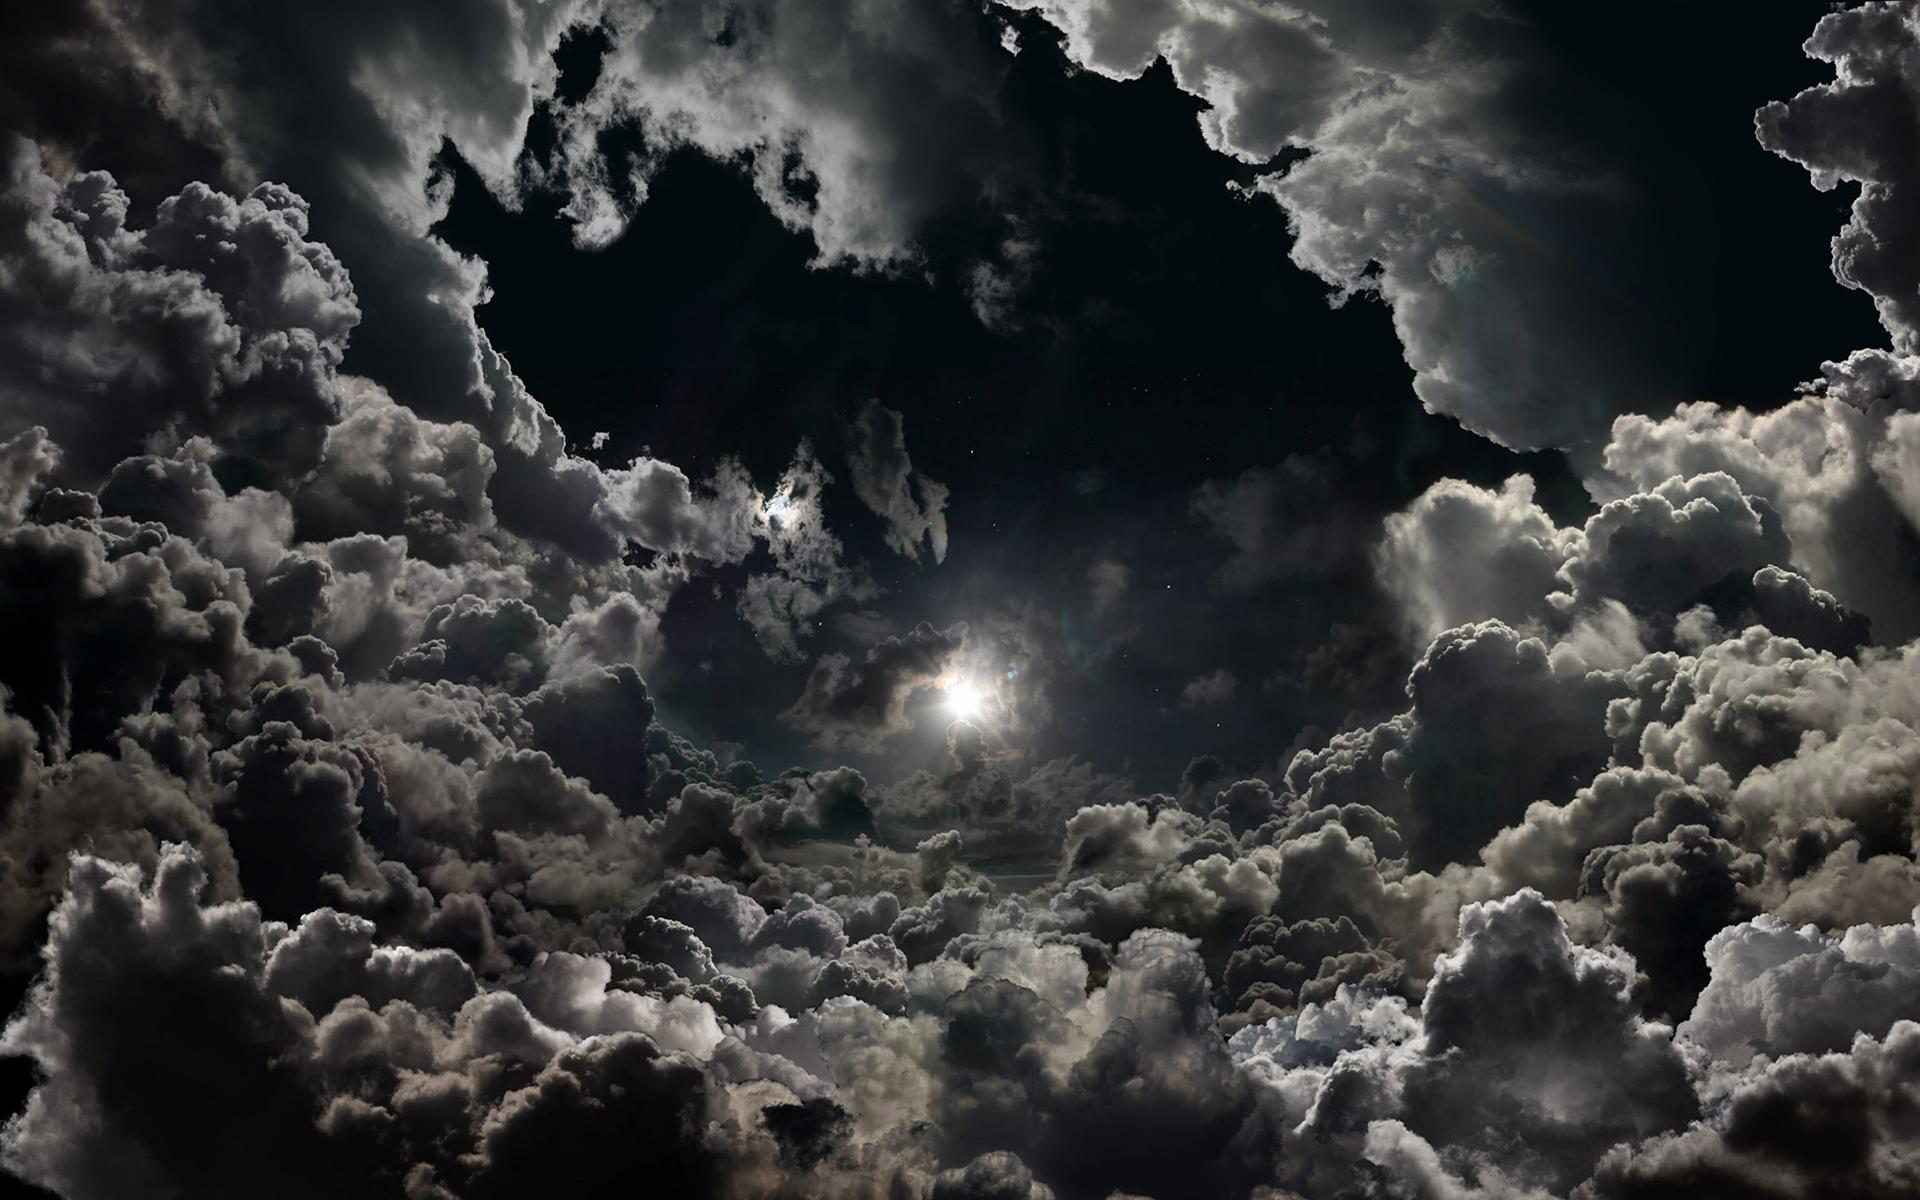 Moonlight Stars Night Clouds Sky Hd Wallpaper